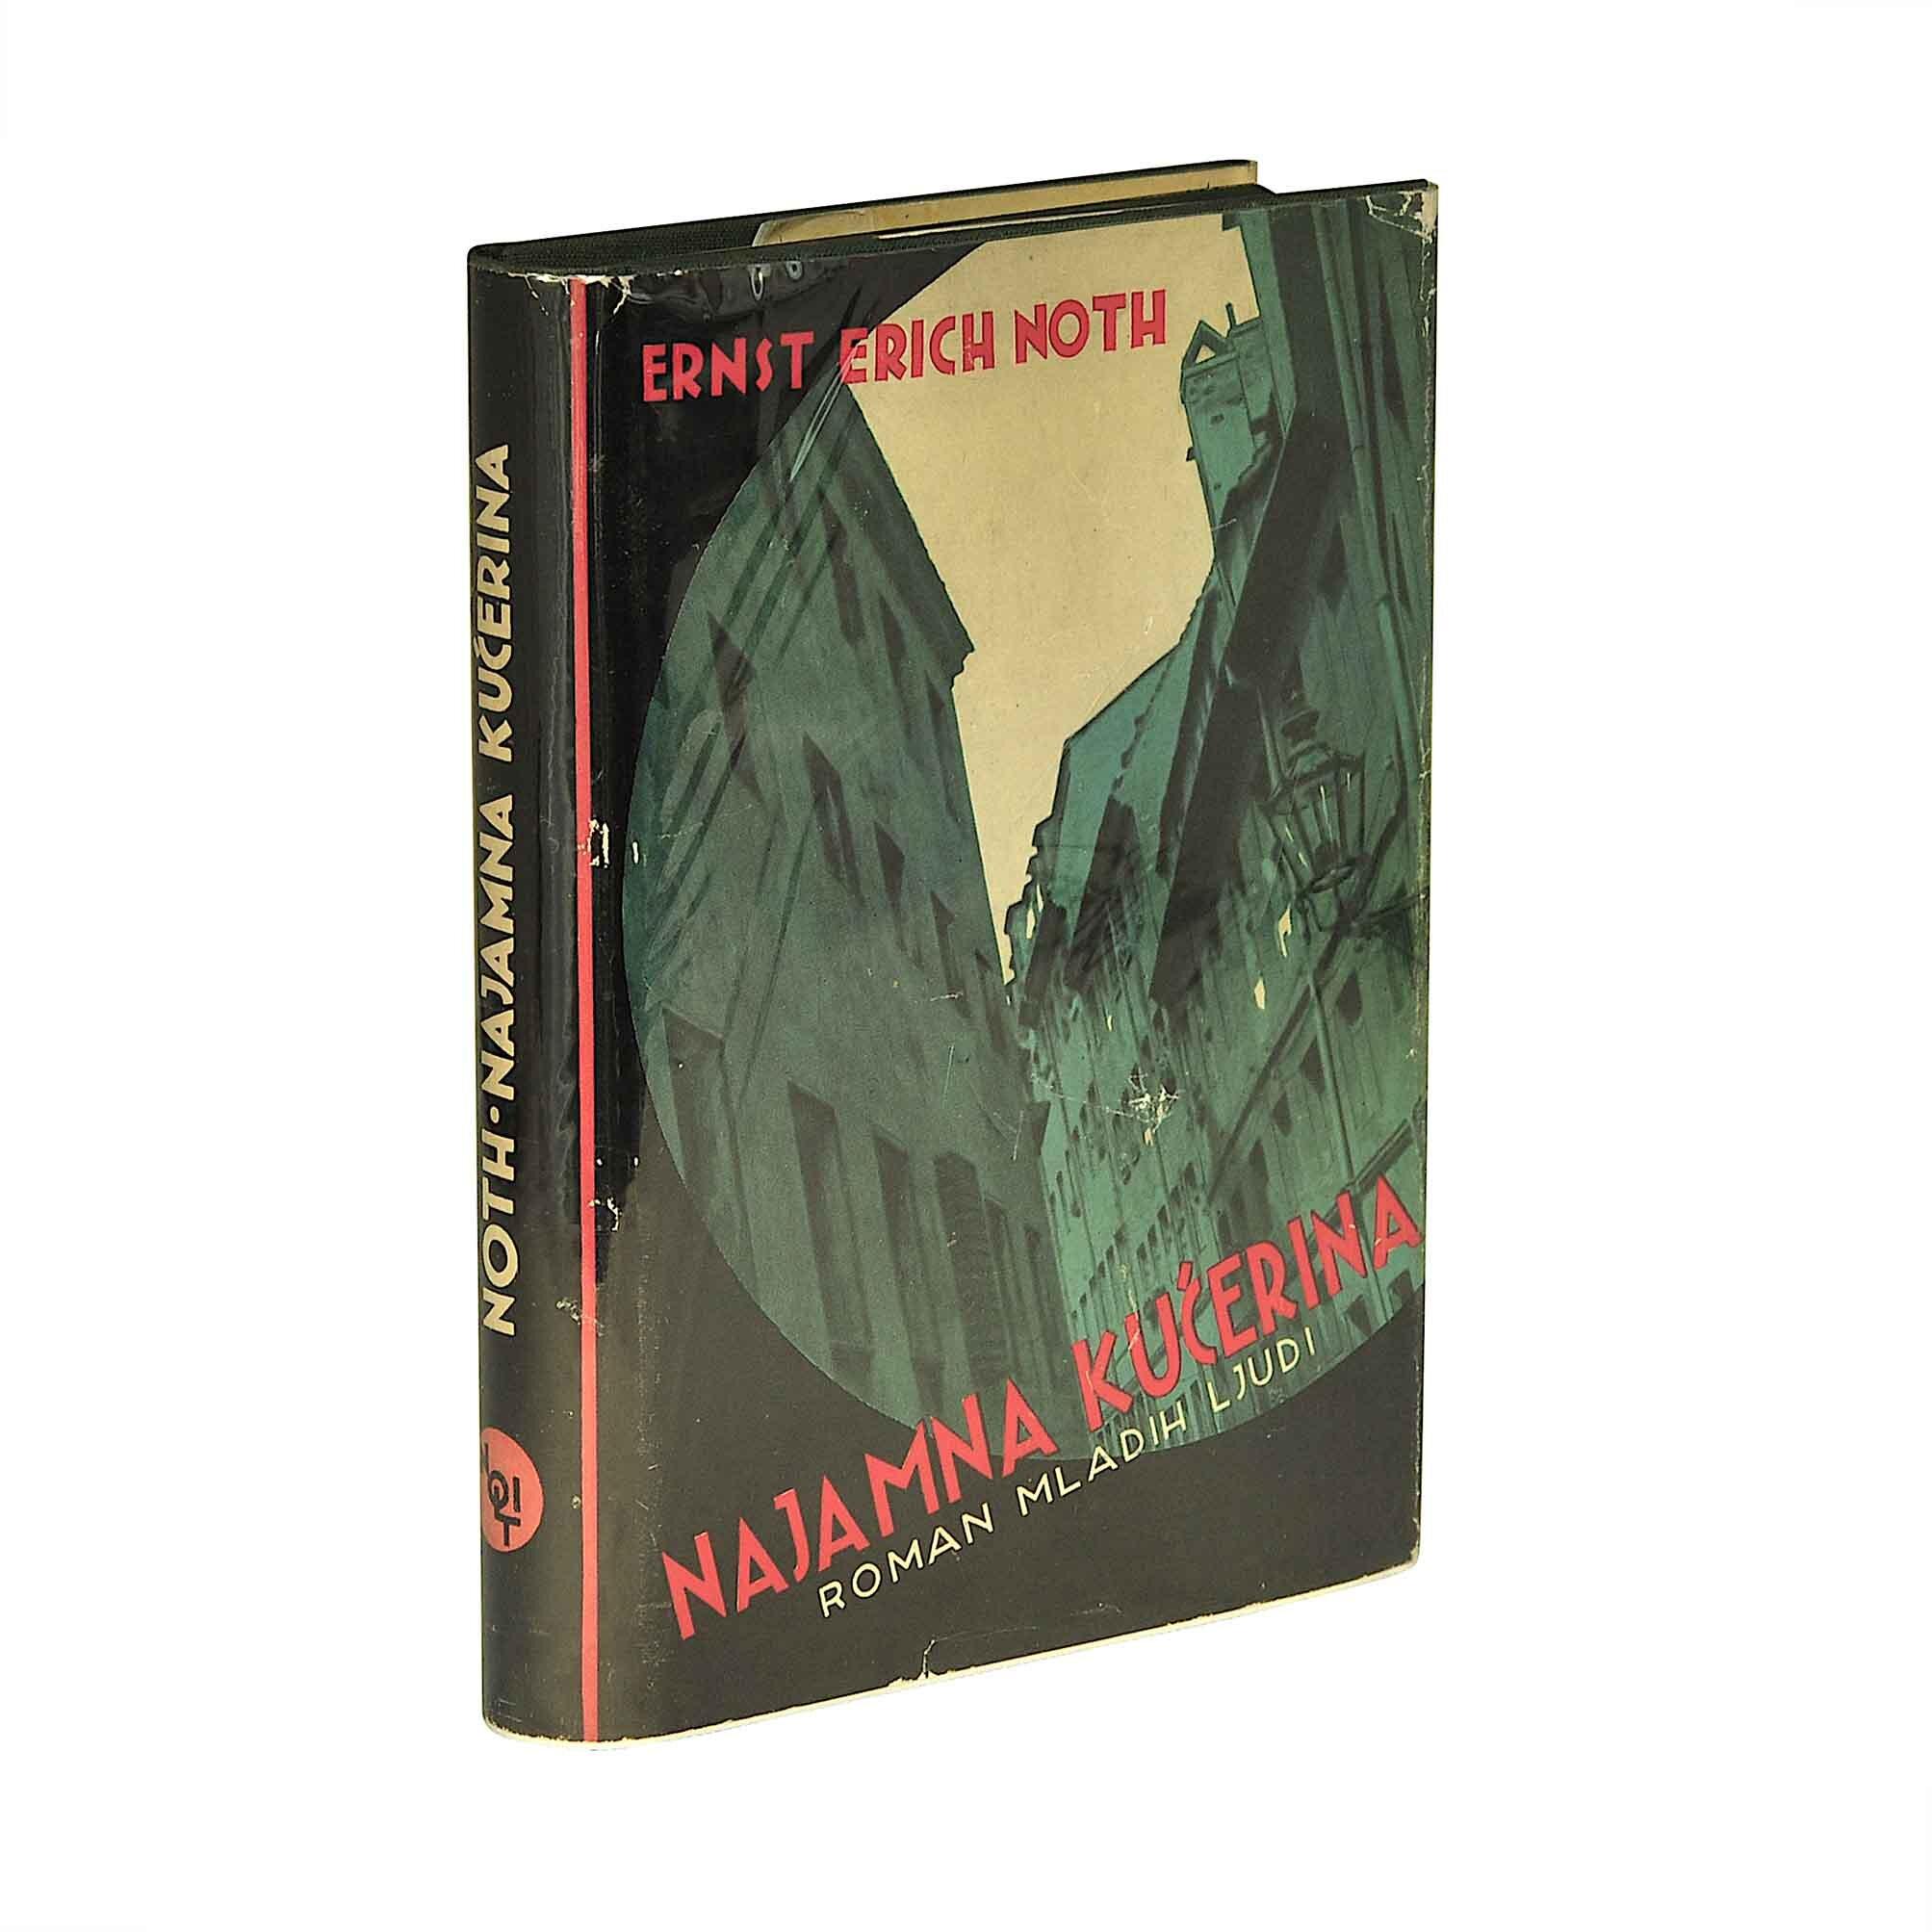 5653 Noth Bihaly Najamna Kucerina Nolit 1933 Umschlag recto Rücken A N